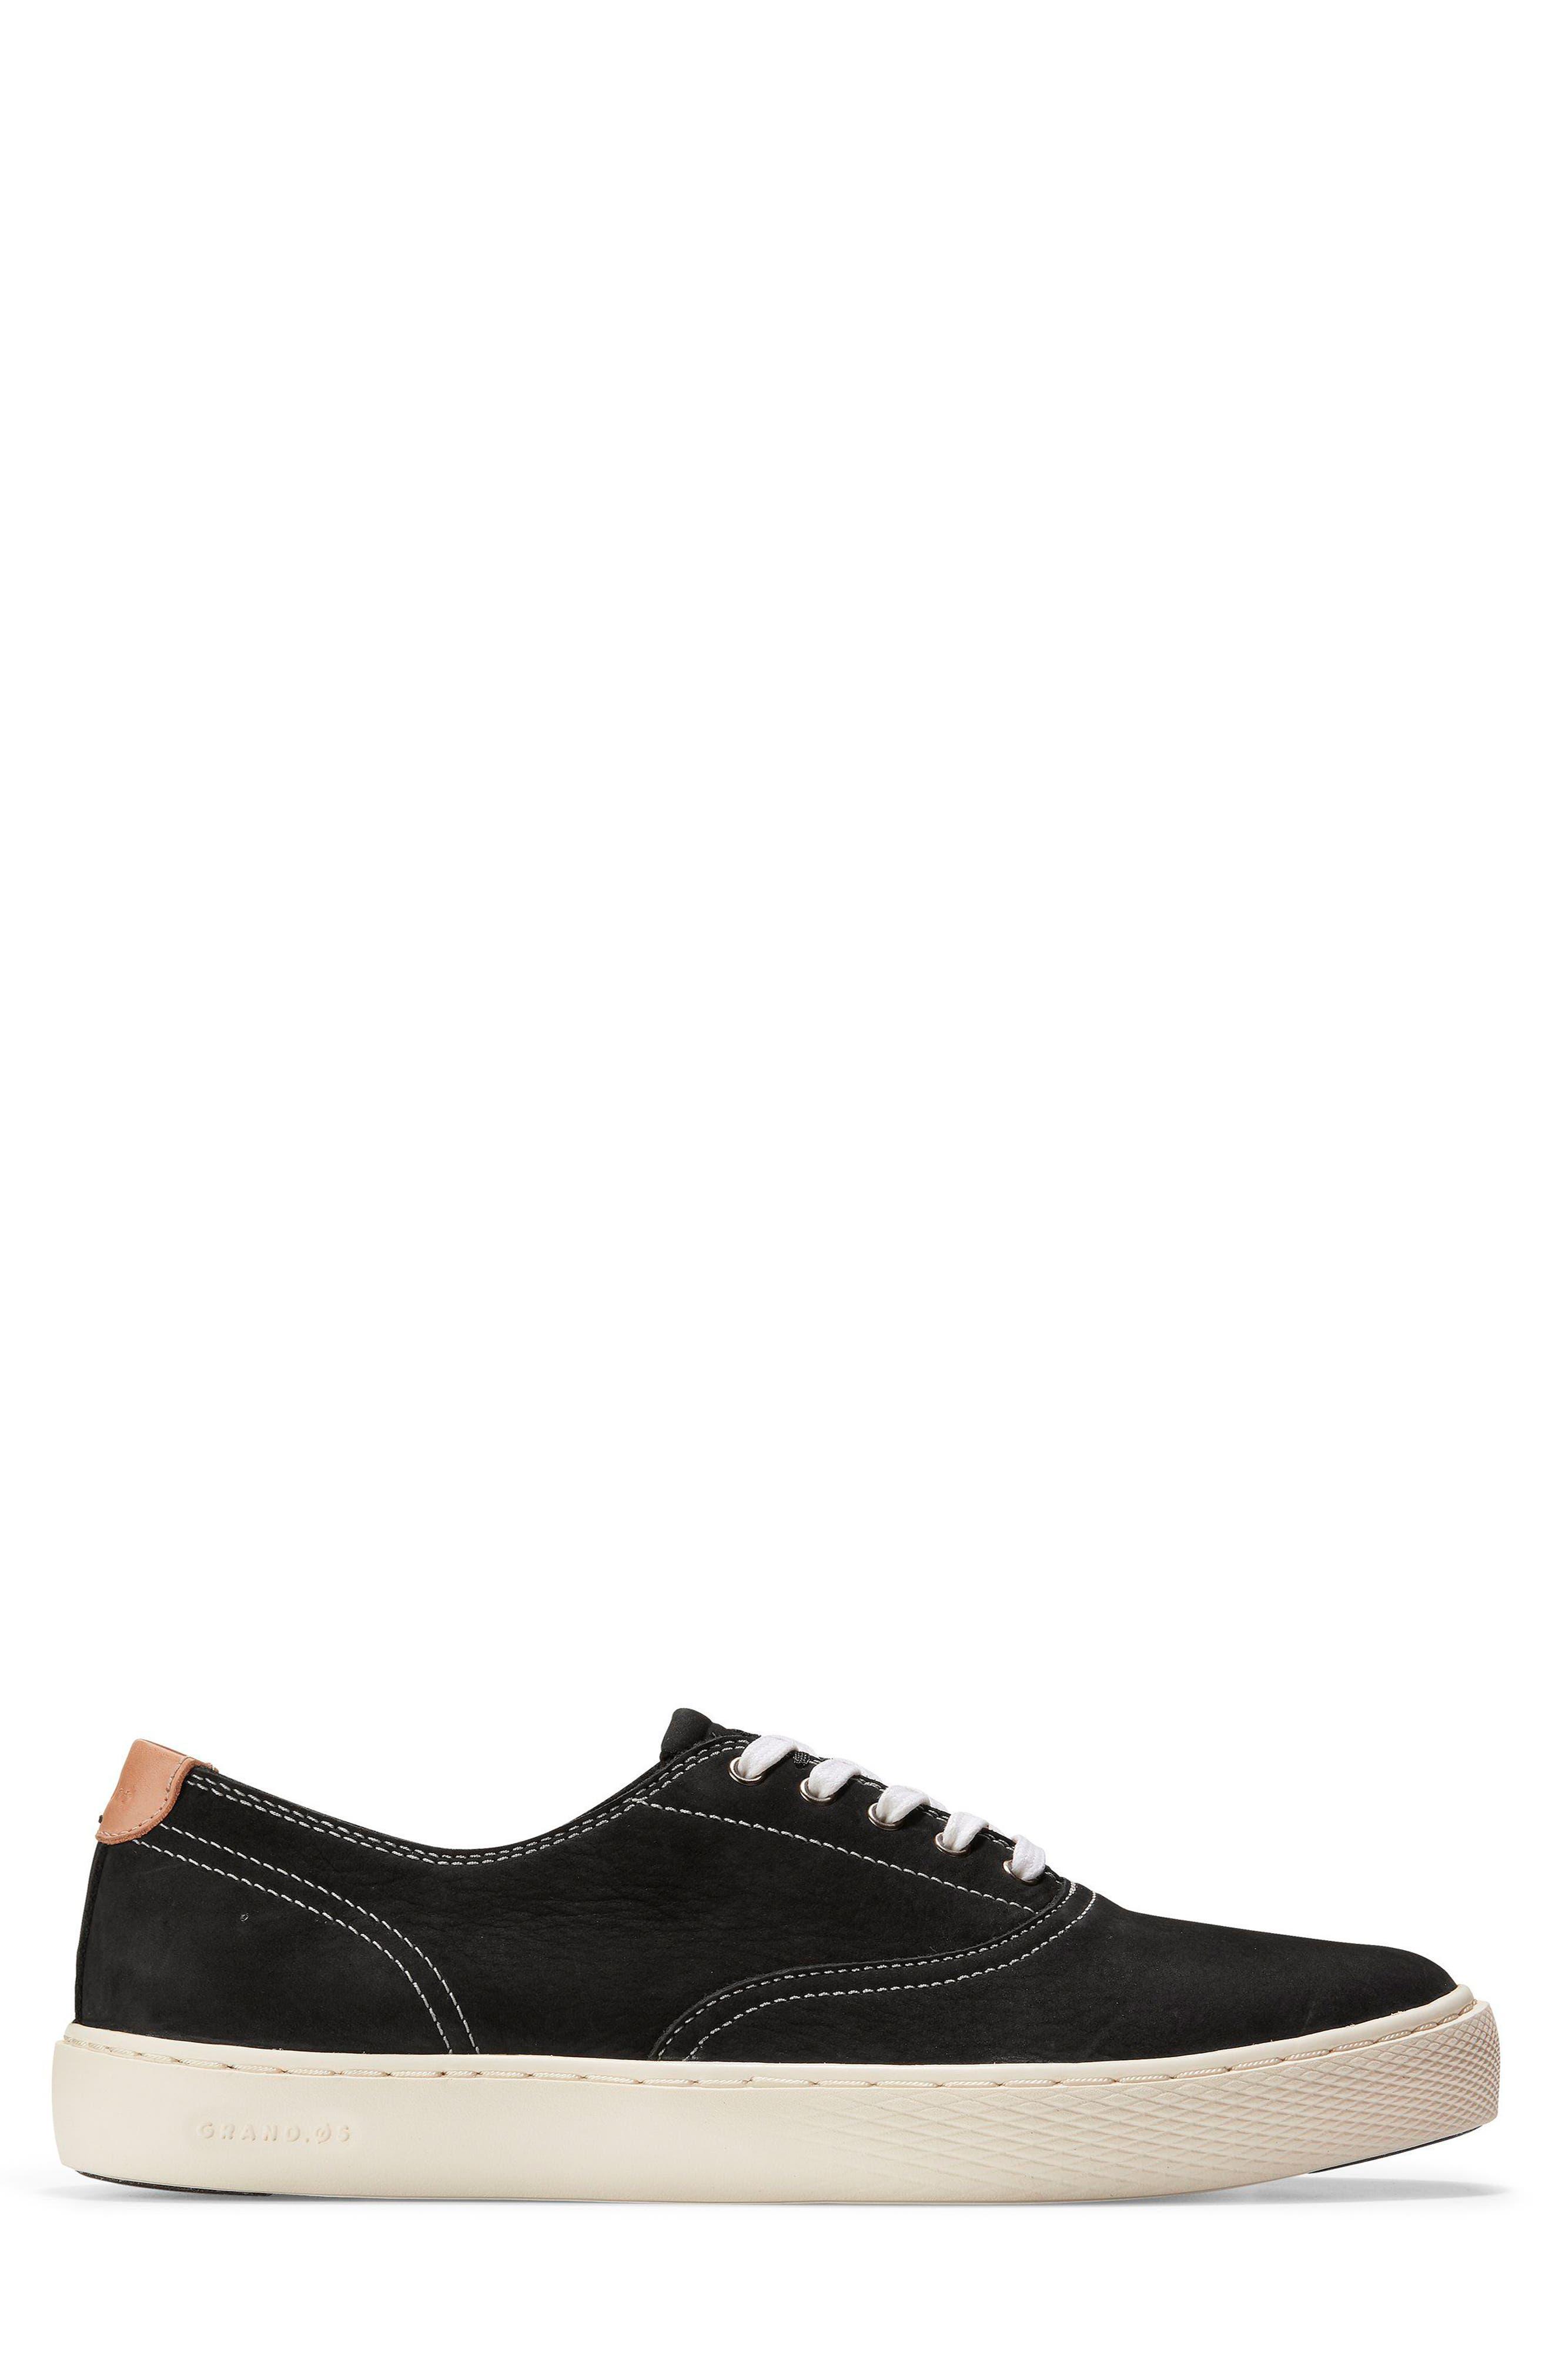 GrandPro Deck Low Top Sneaker,                             Alternate thumbnail 3, color,                             001